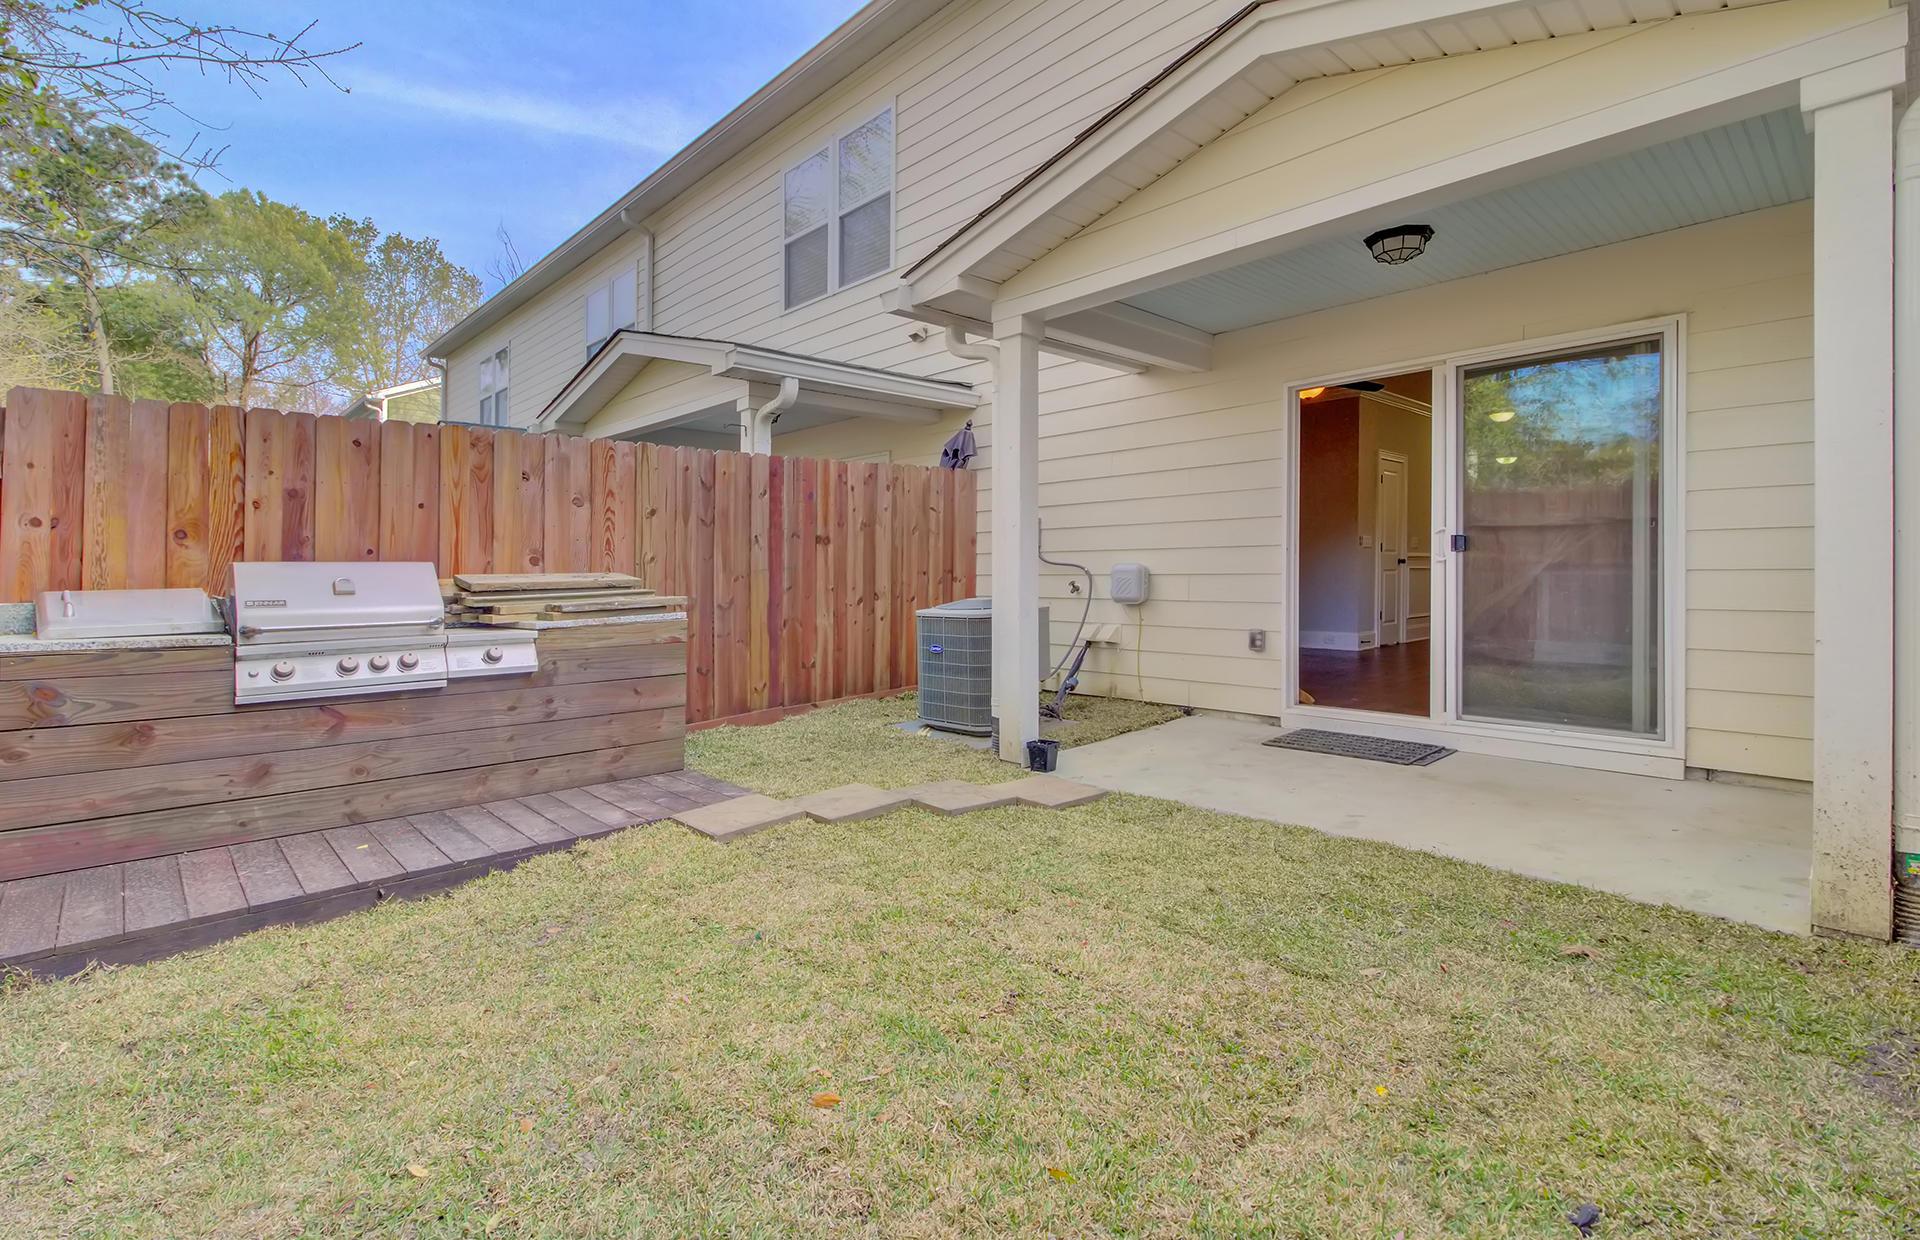 Carol Oaks Town Homes Homes For Sale - 2960 Emma, Mount Pleasant, SC - 21